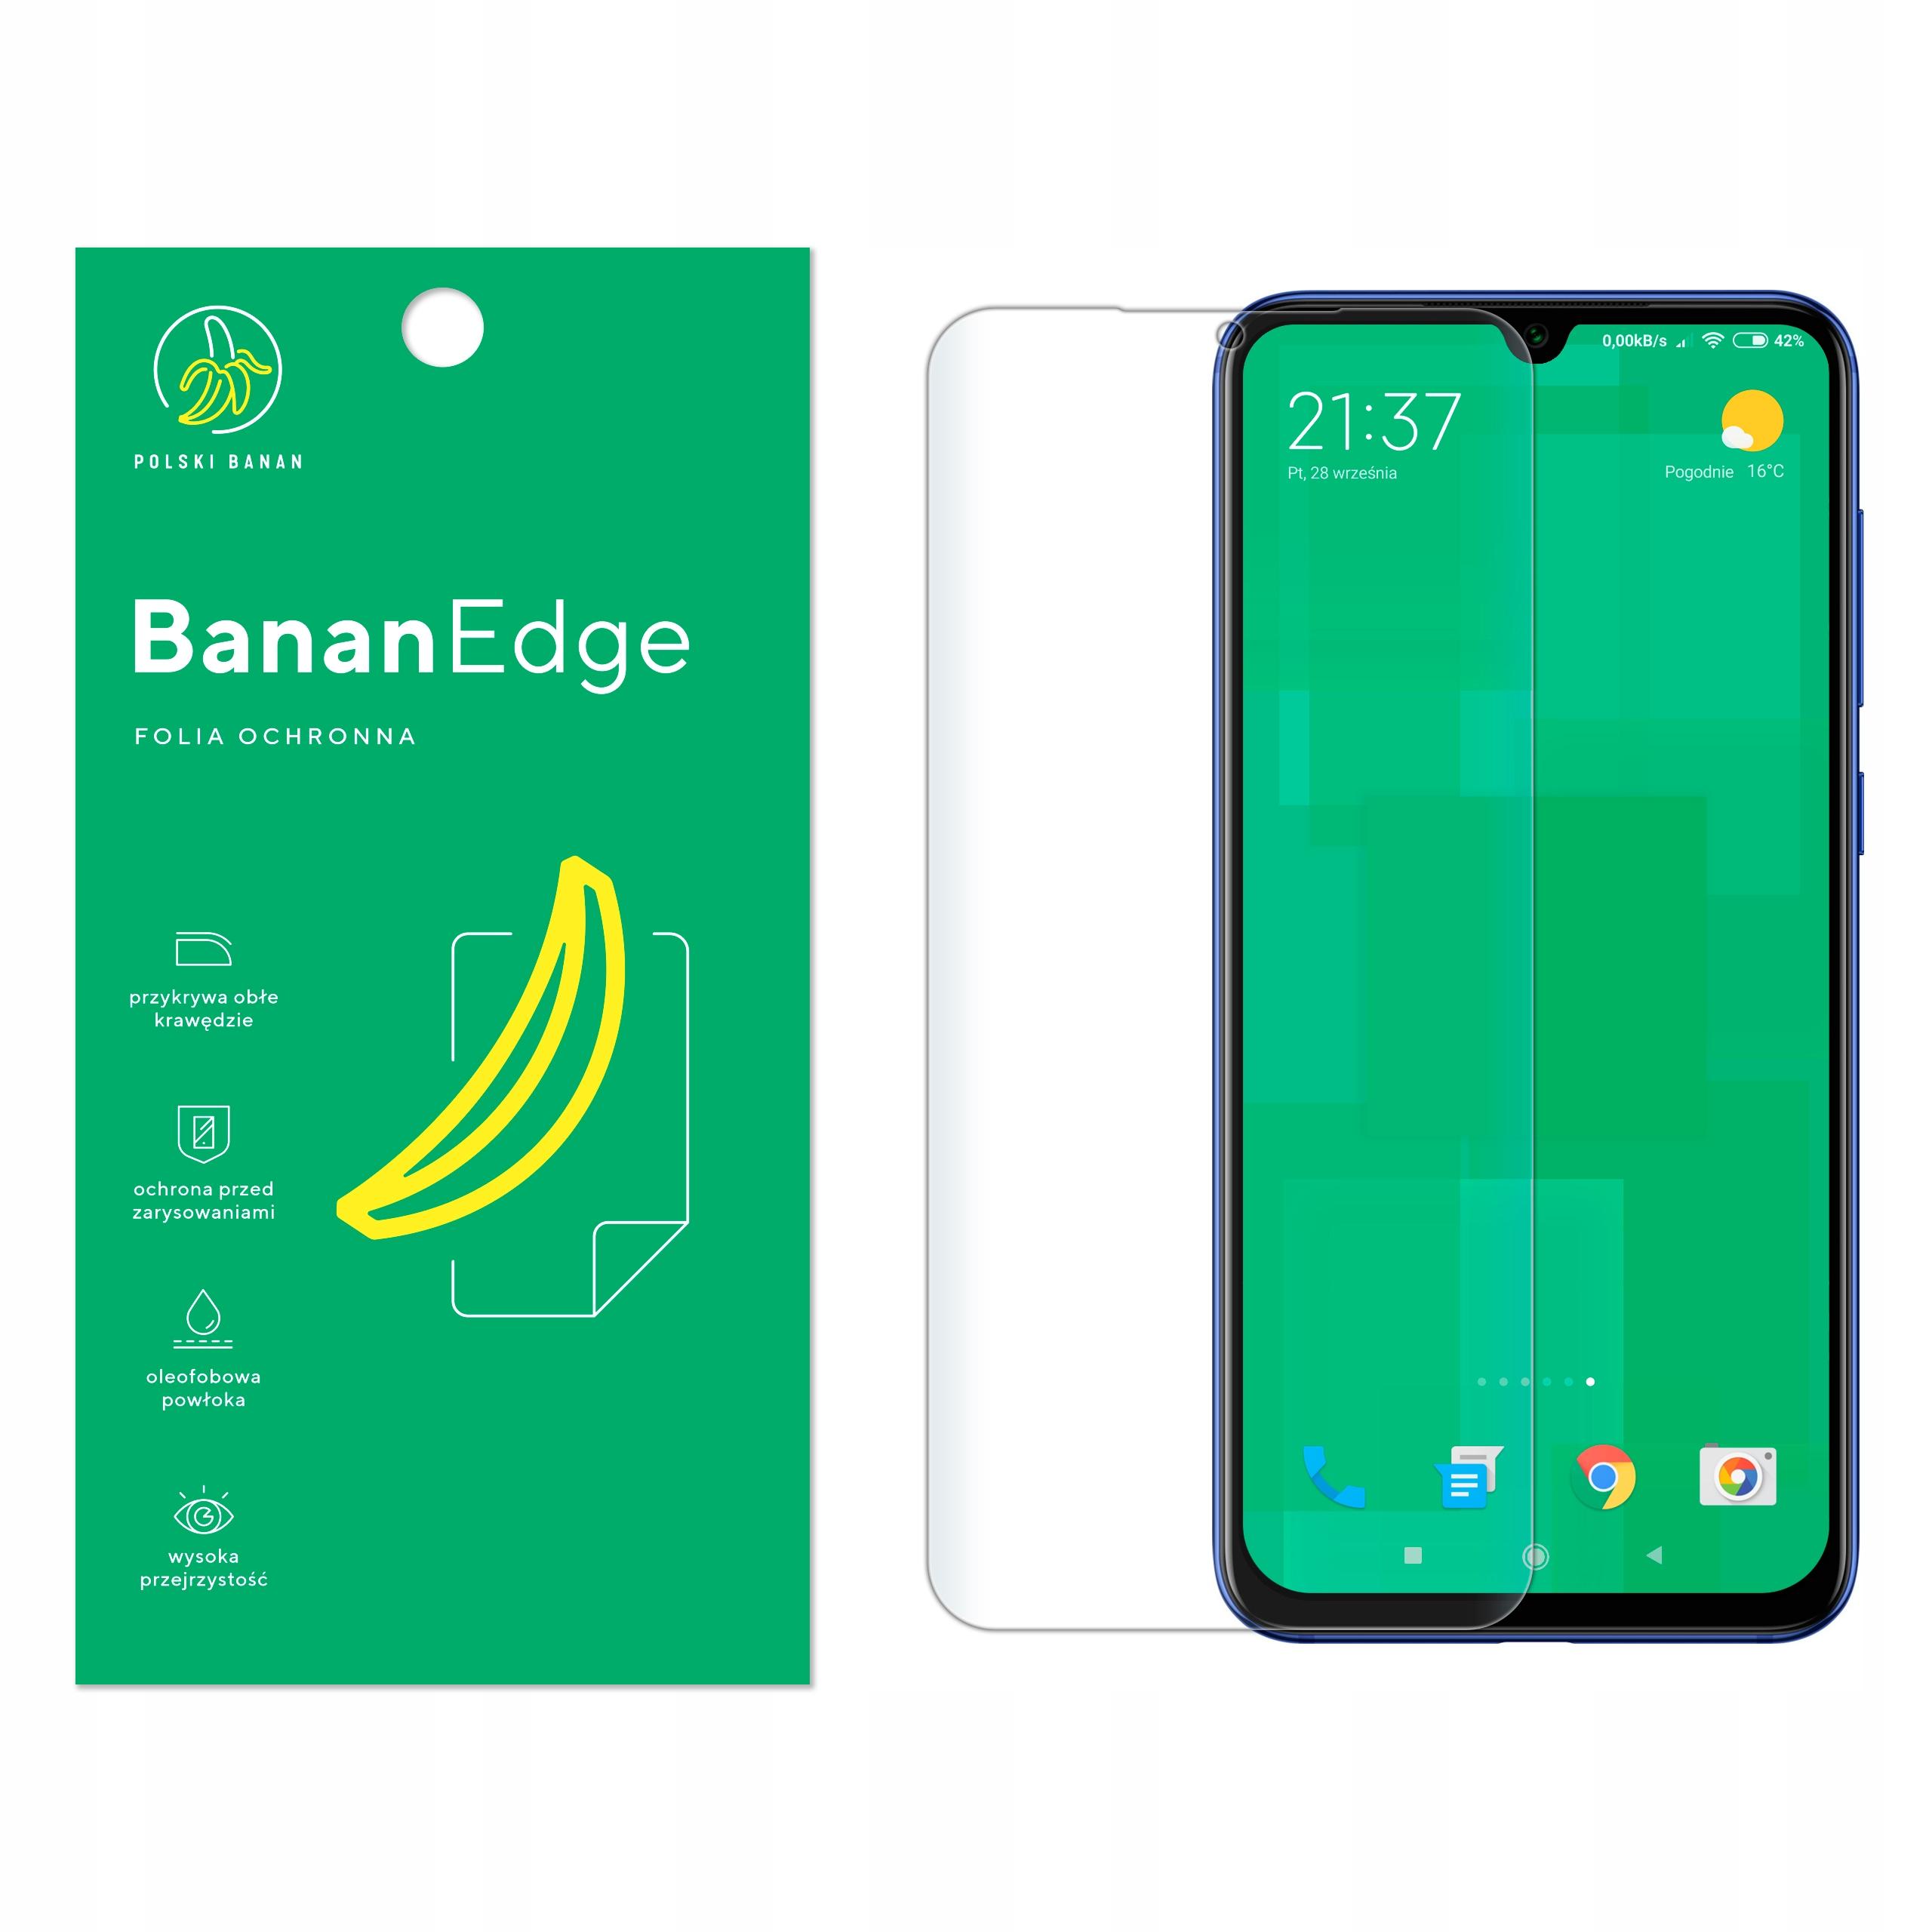 Folia Ochronna Polski Banan do Xiaomi Mi 9 Se